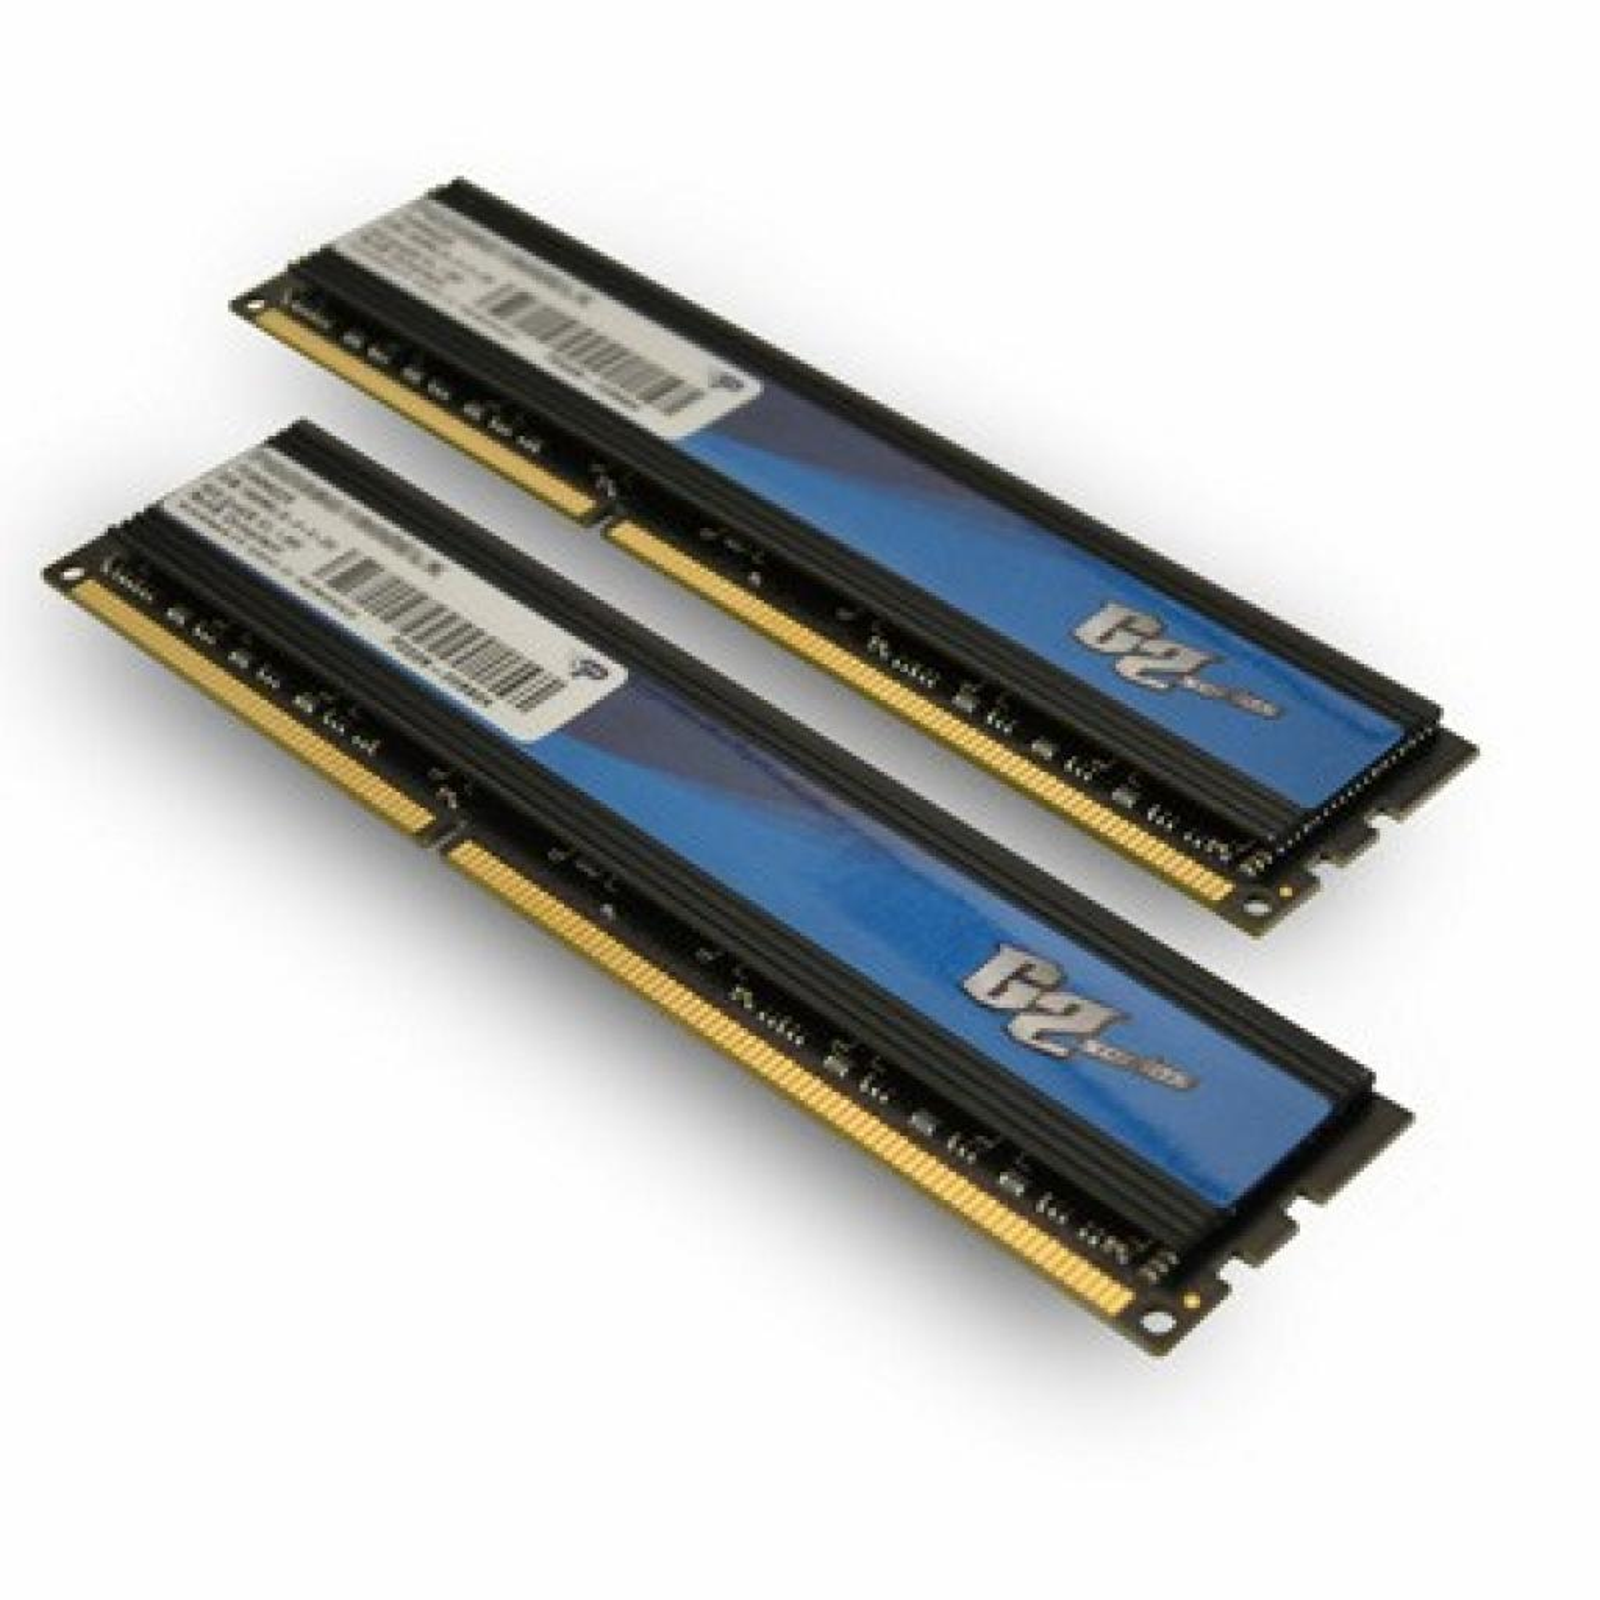 Модуль памяти для компьютера DDR3 16GB (2x8GB) 1600 MHz Patriot (PGD316G1600ELK)